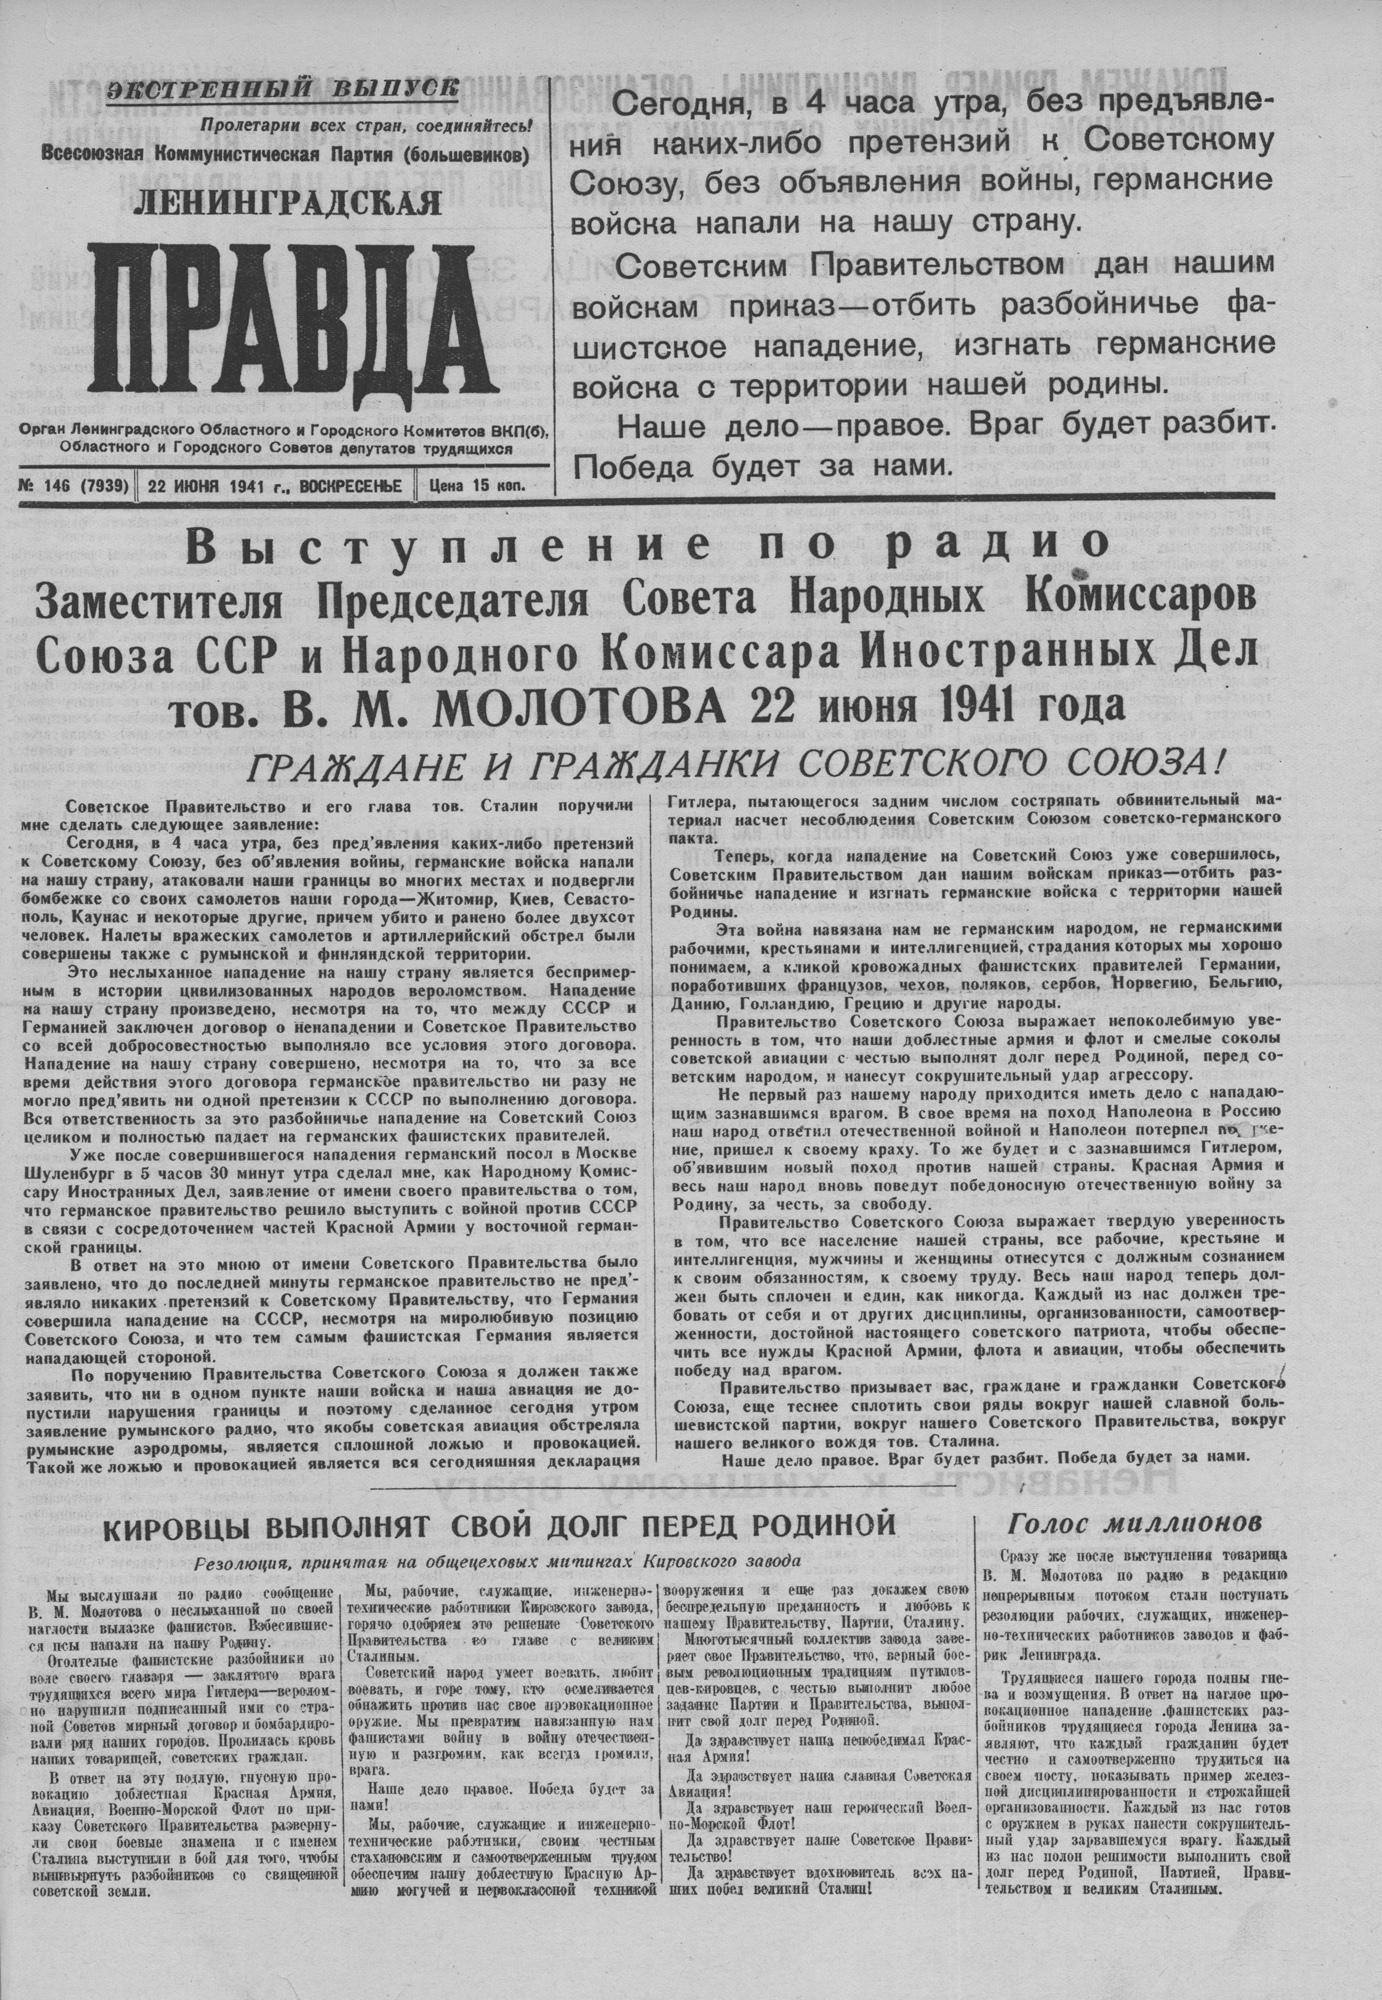 Газета «Ленинградская правда» 22 июня 1941 года